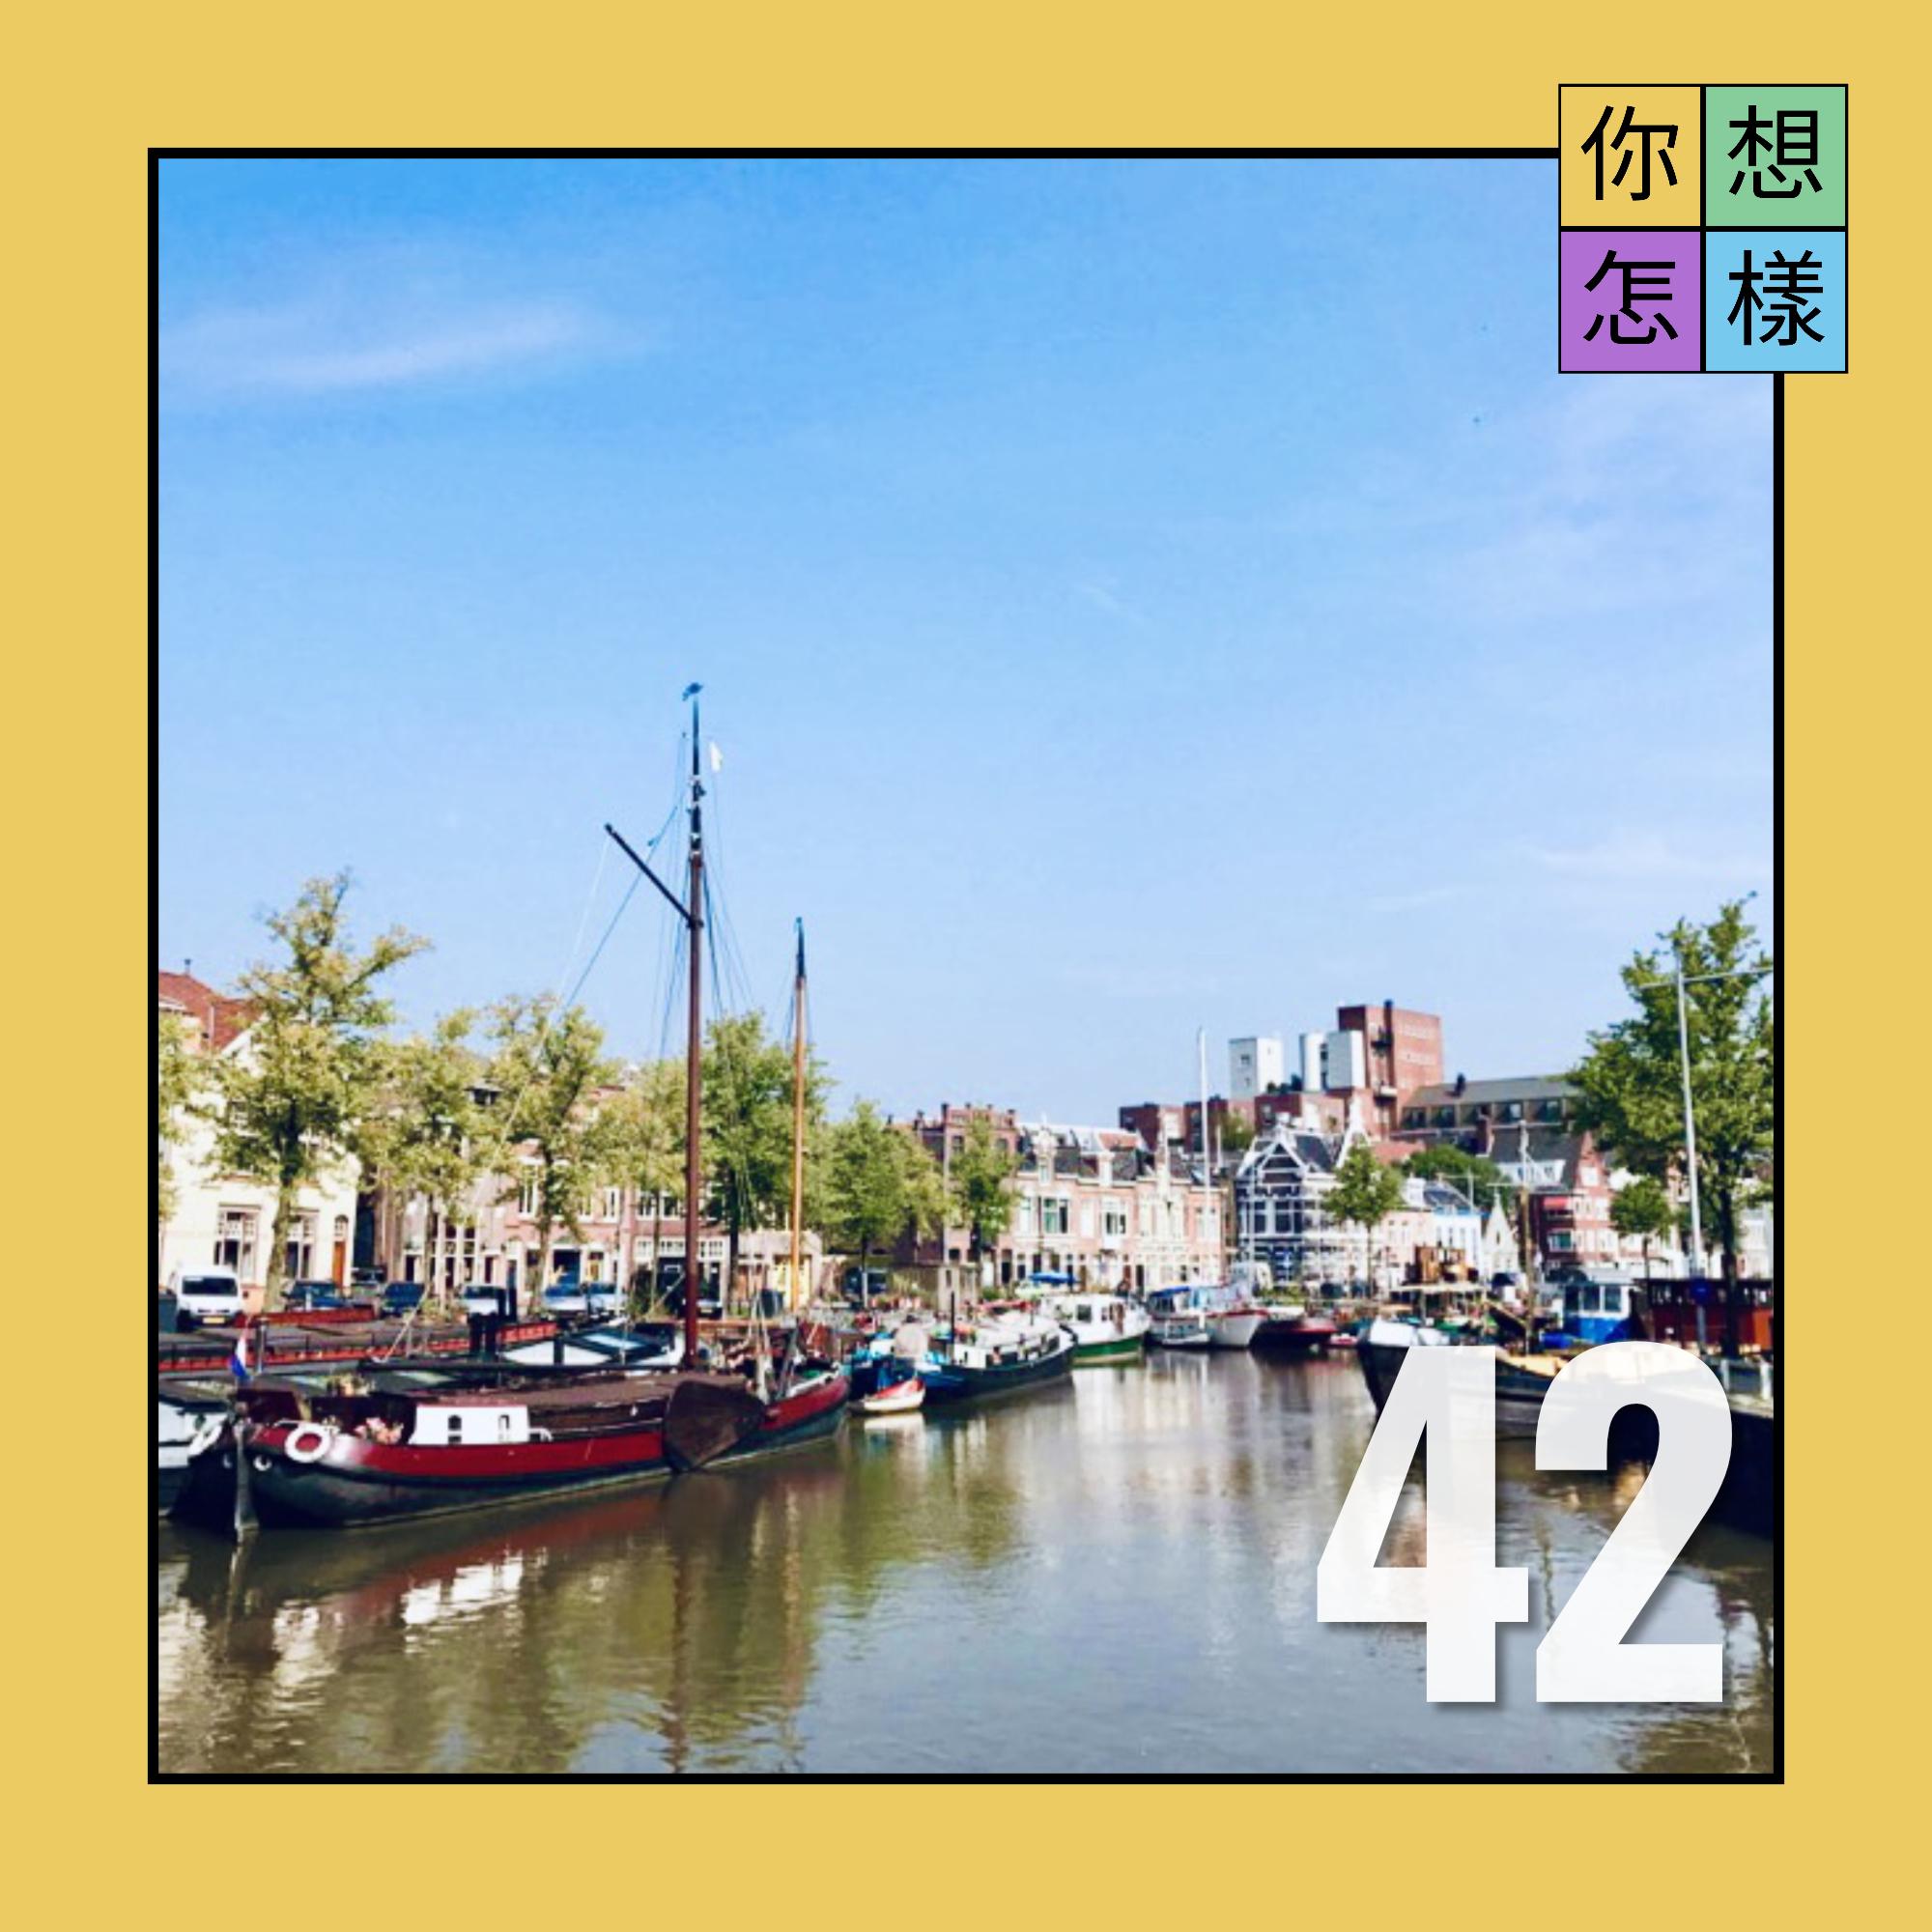 Episode 42 - 揭開 Groningen 神秘面紗!(Feat. 史巴不 ho 蘭)